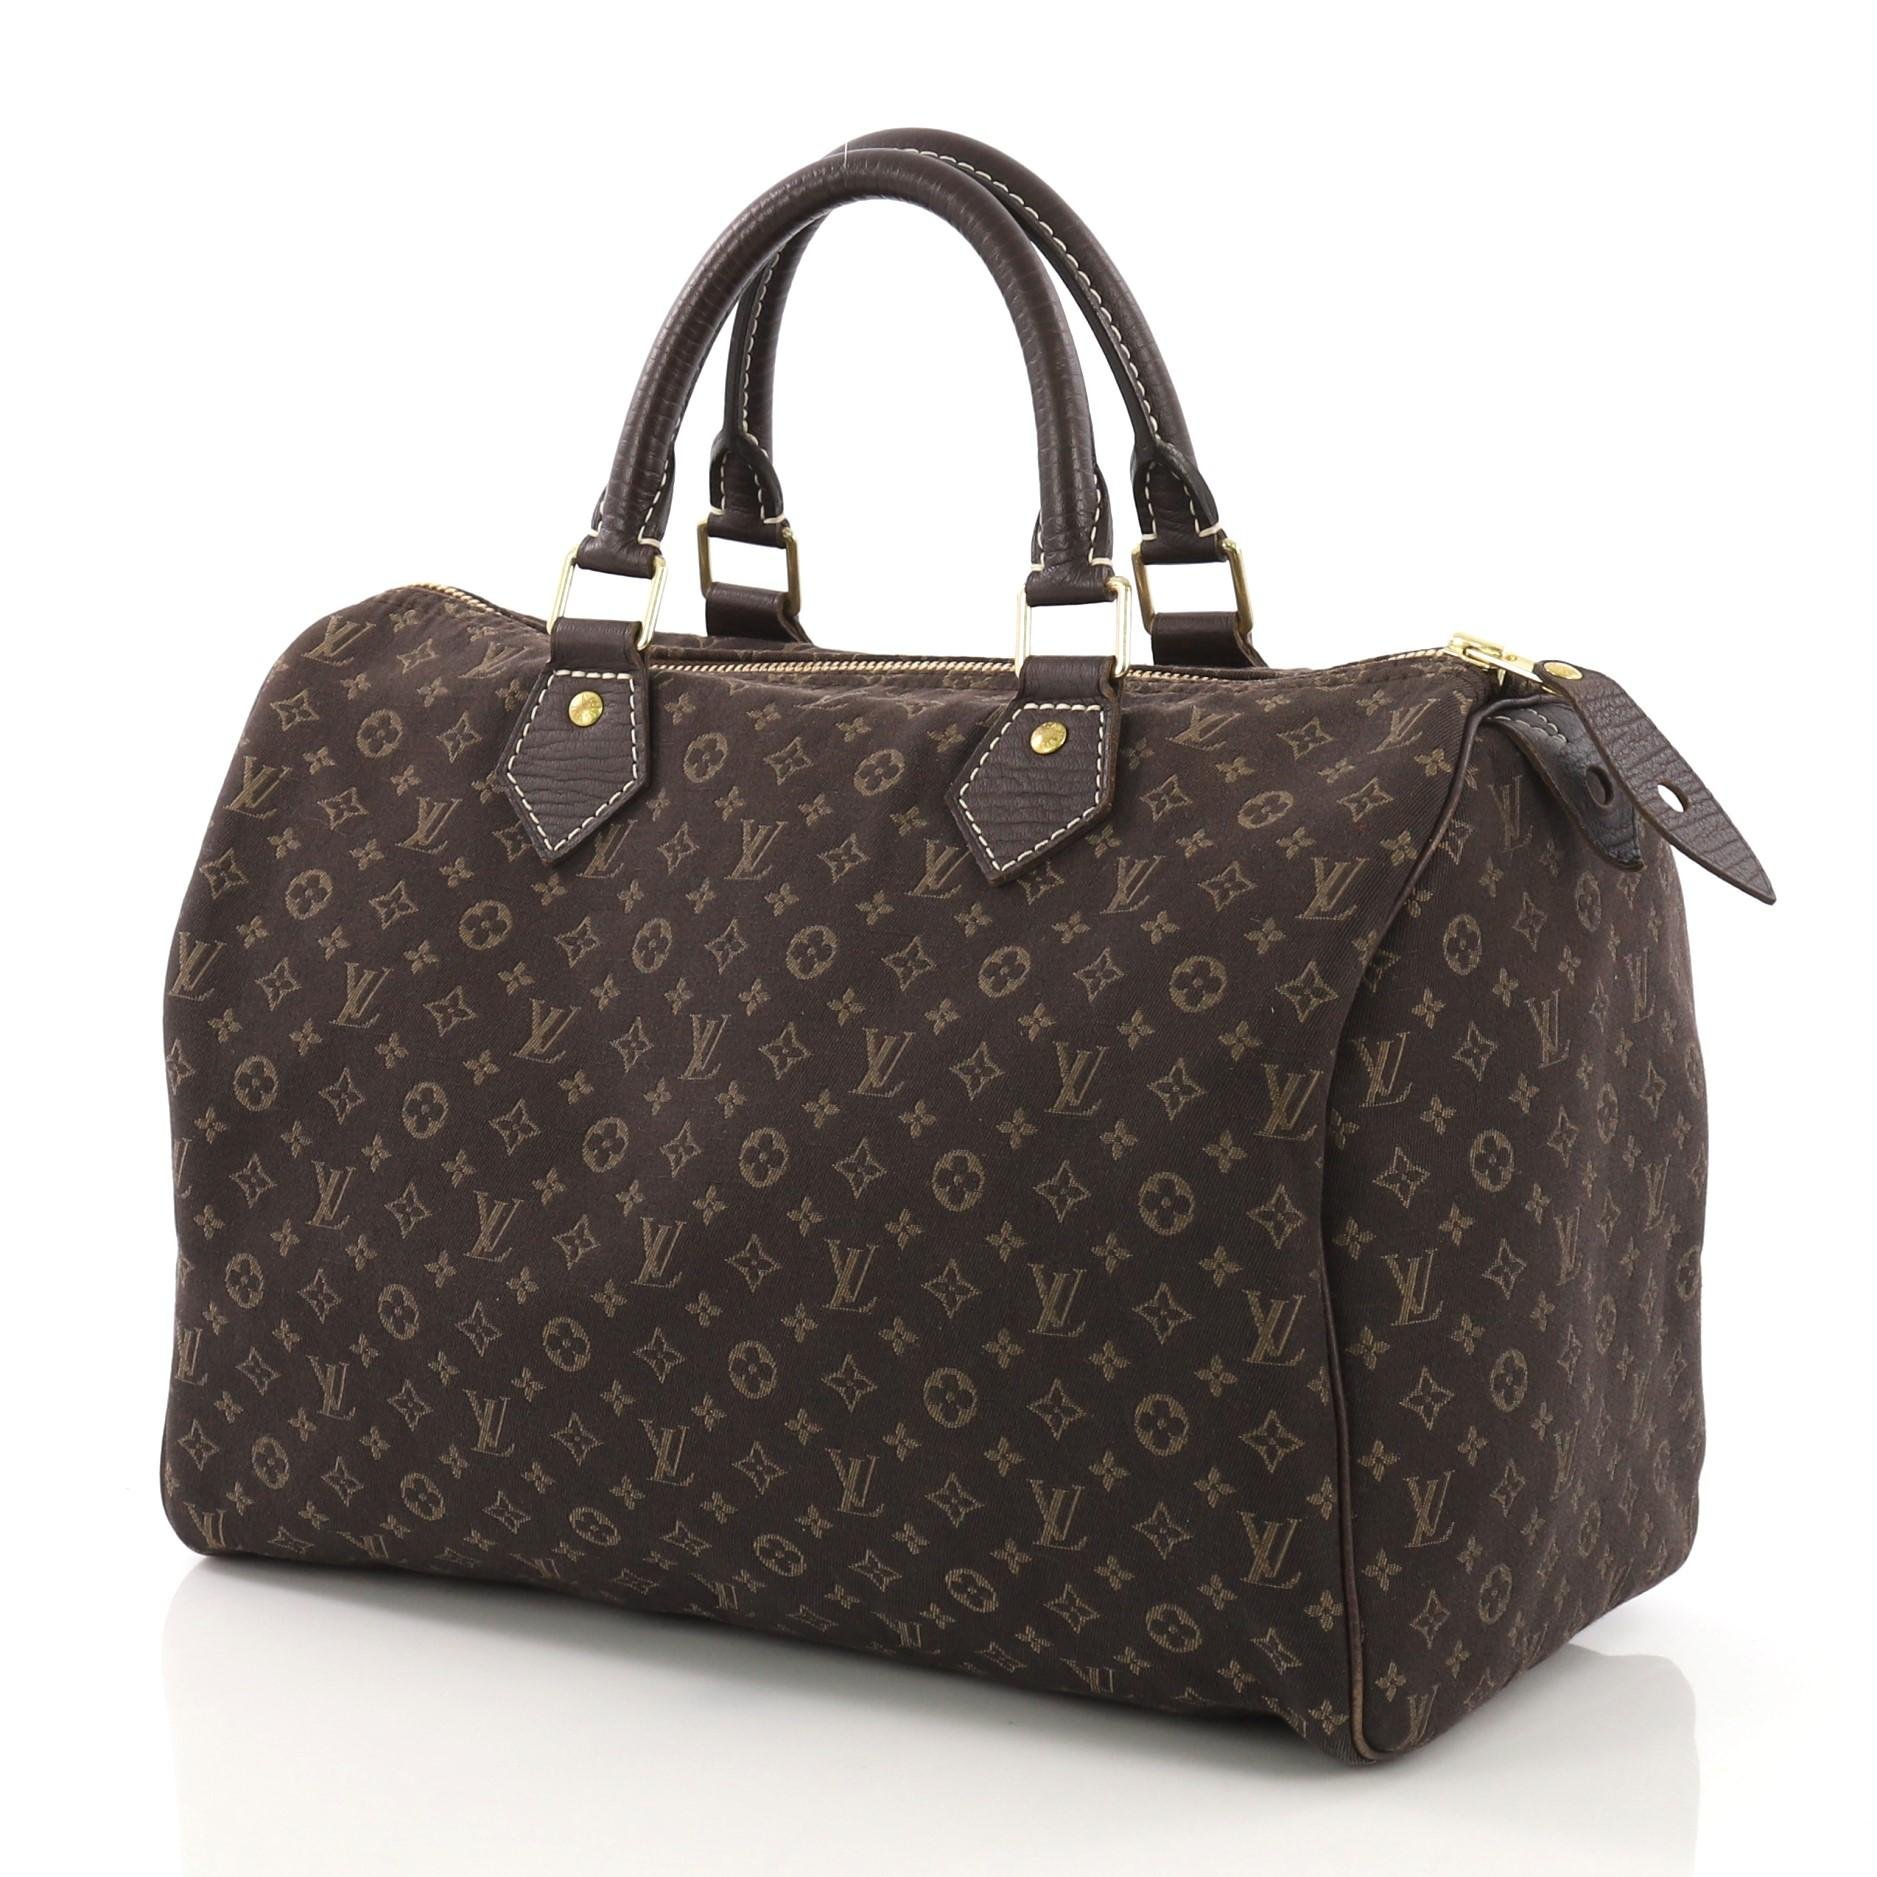 ad6756e6dd2f Louis Vuitton Speedy Handbag Mini Lin 30